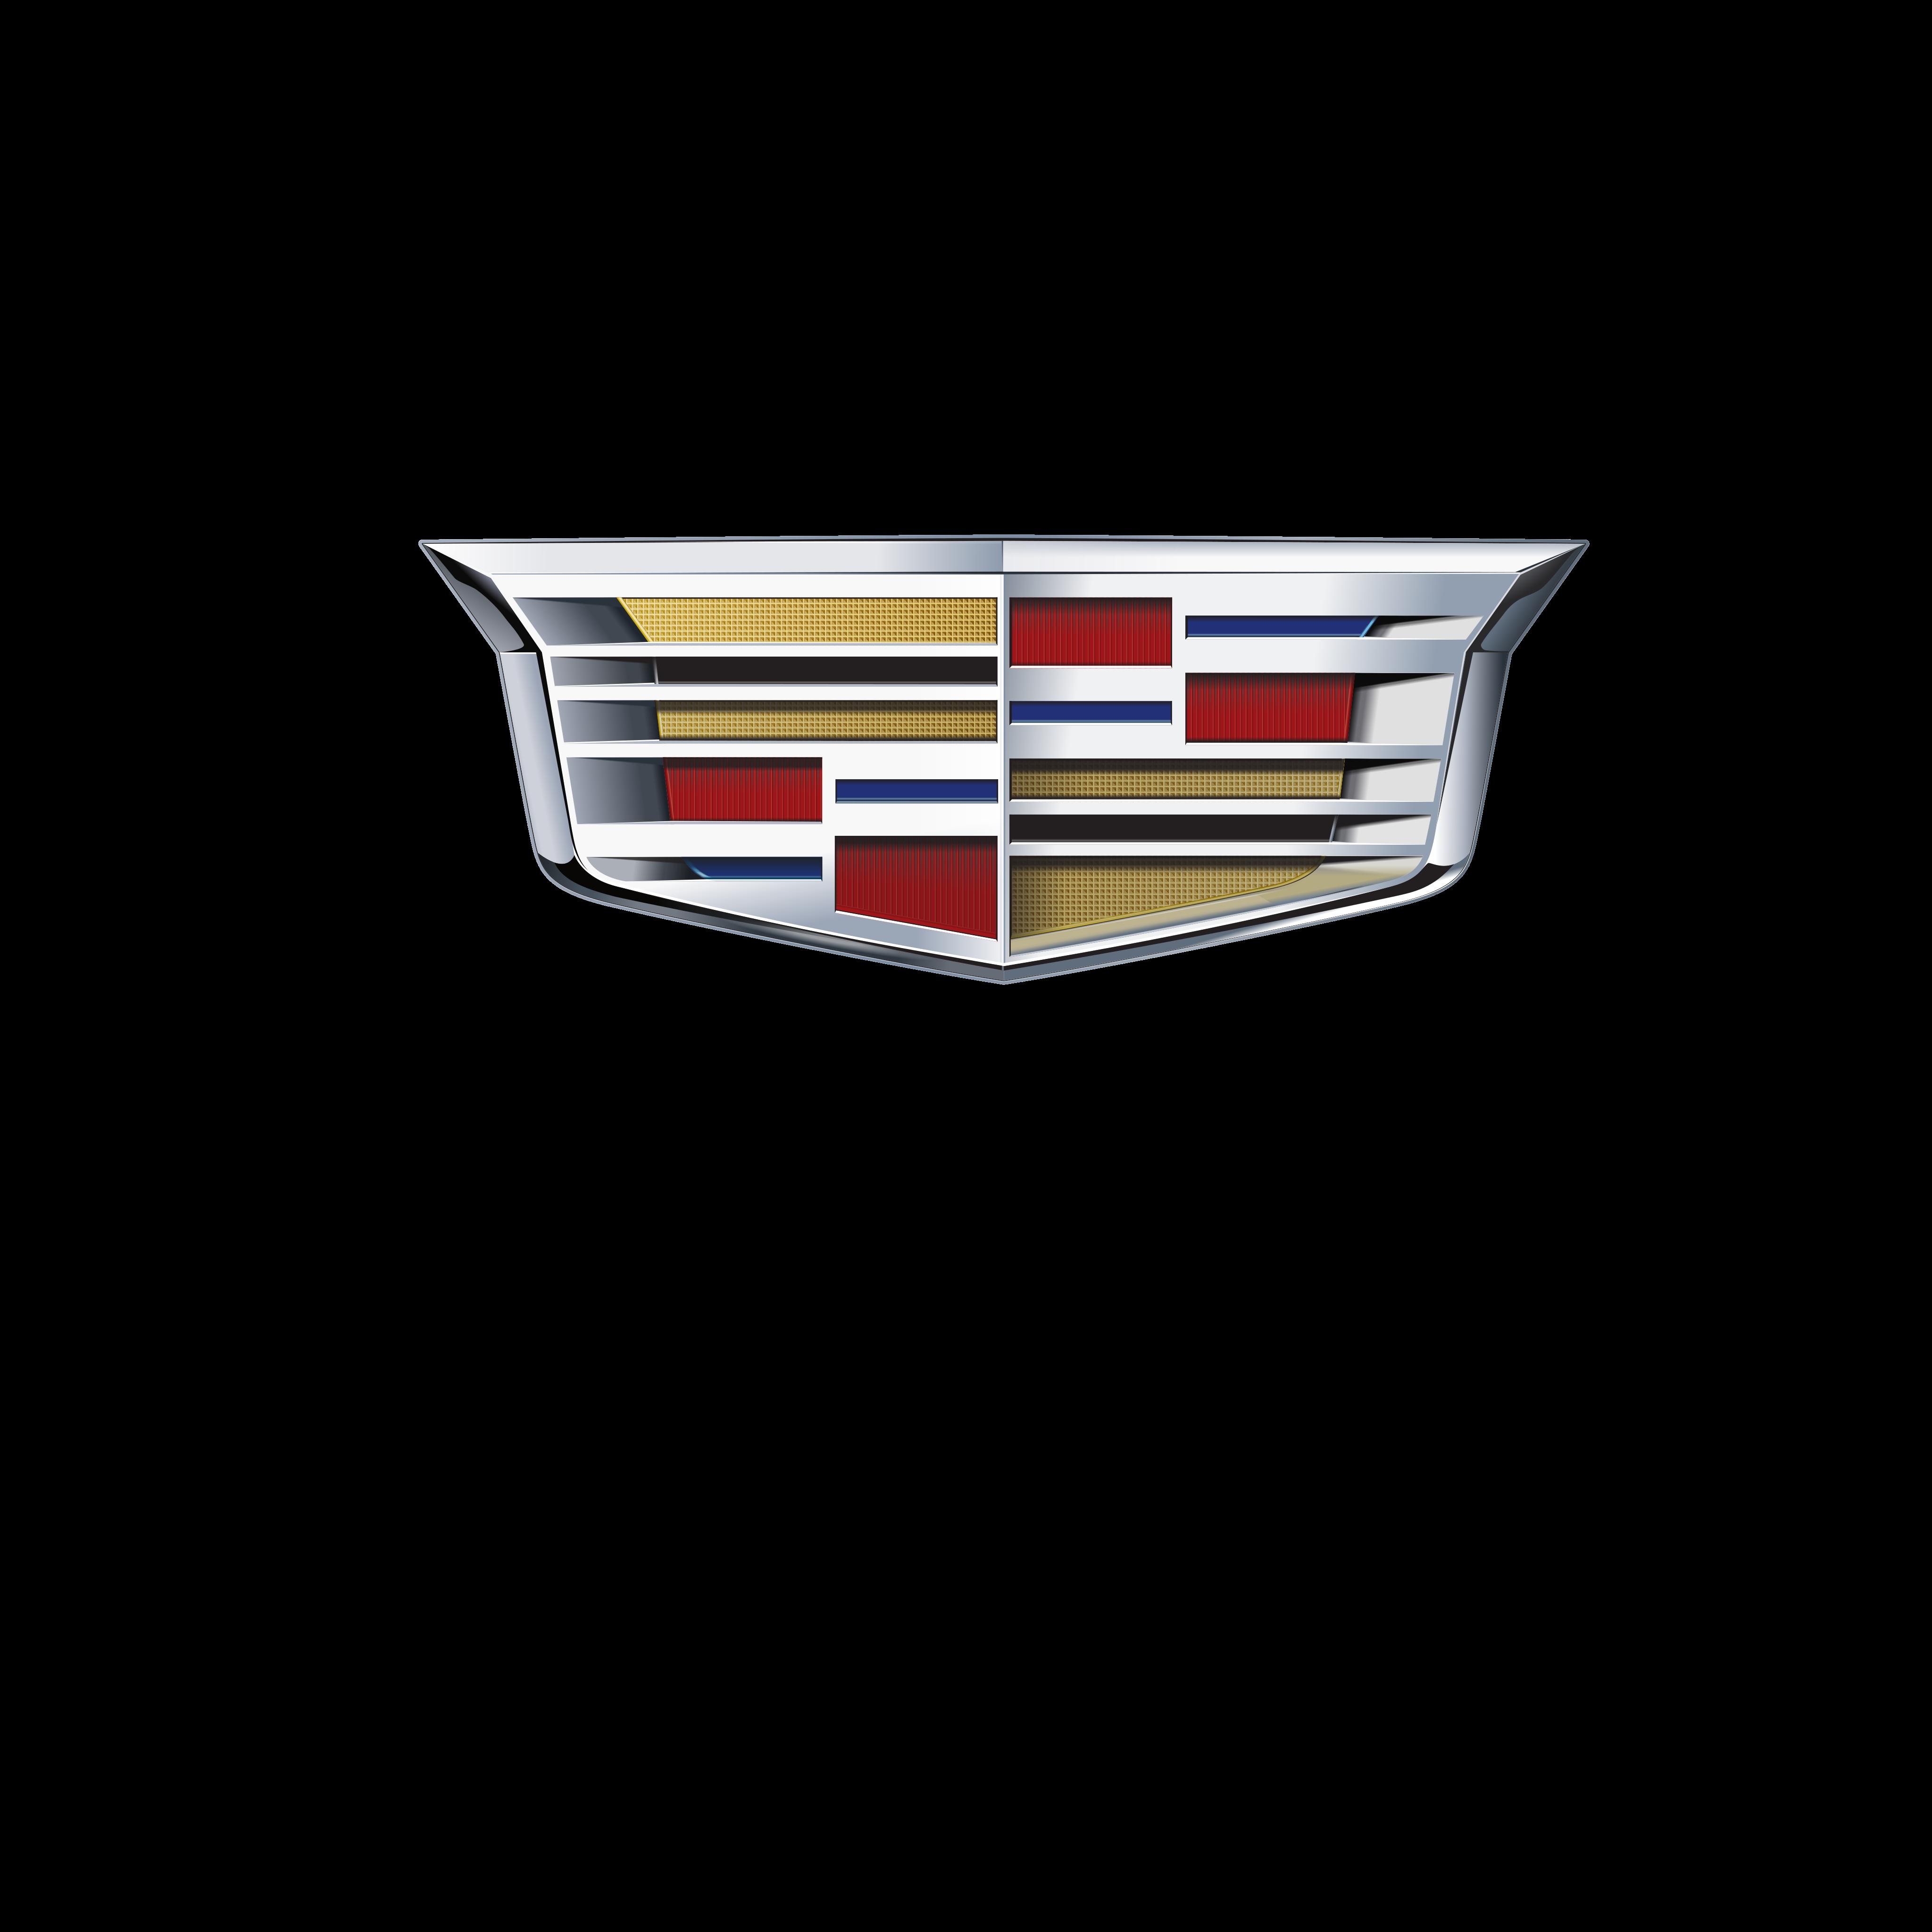 cadillac logo 0 - Cadillac Logo